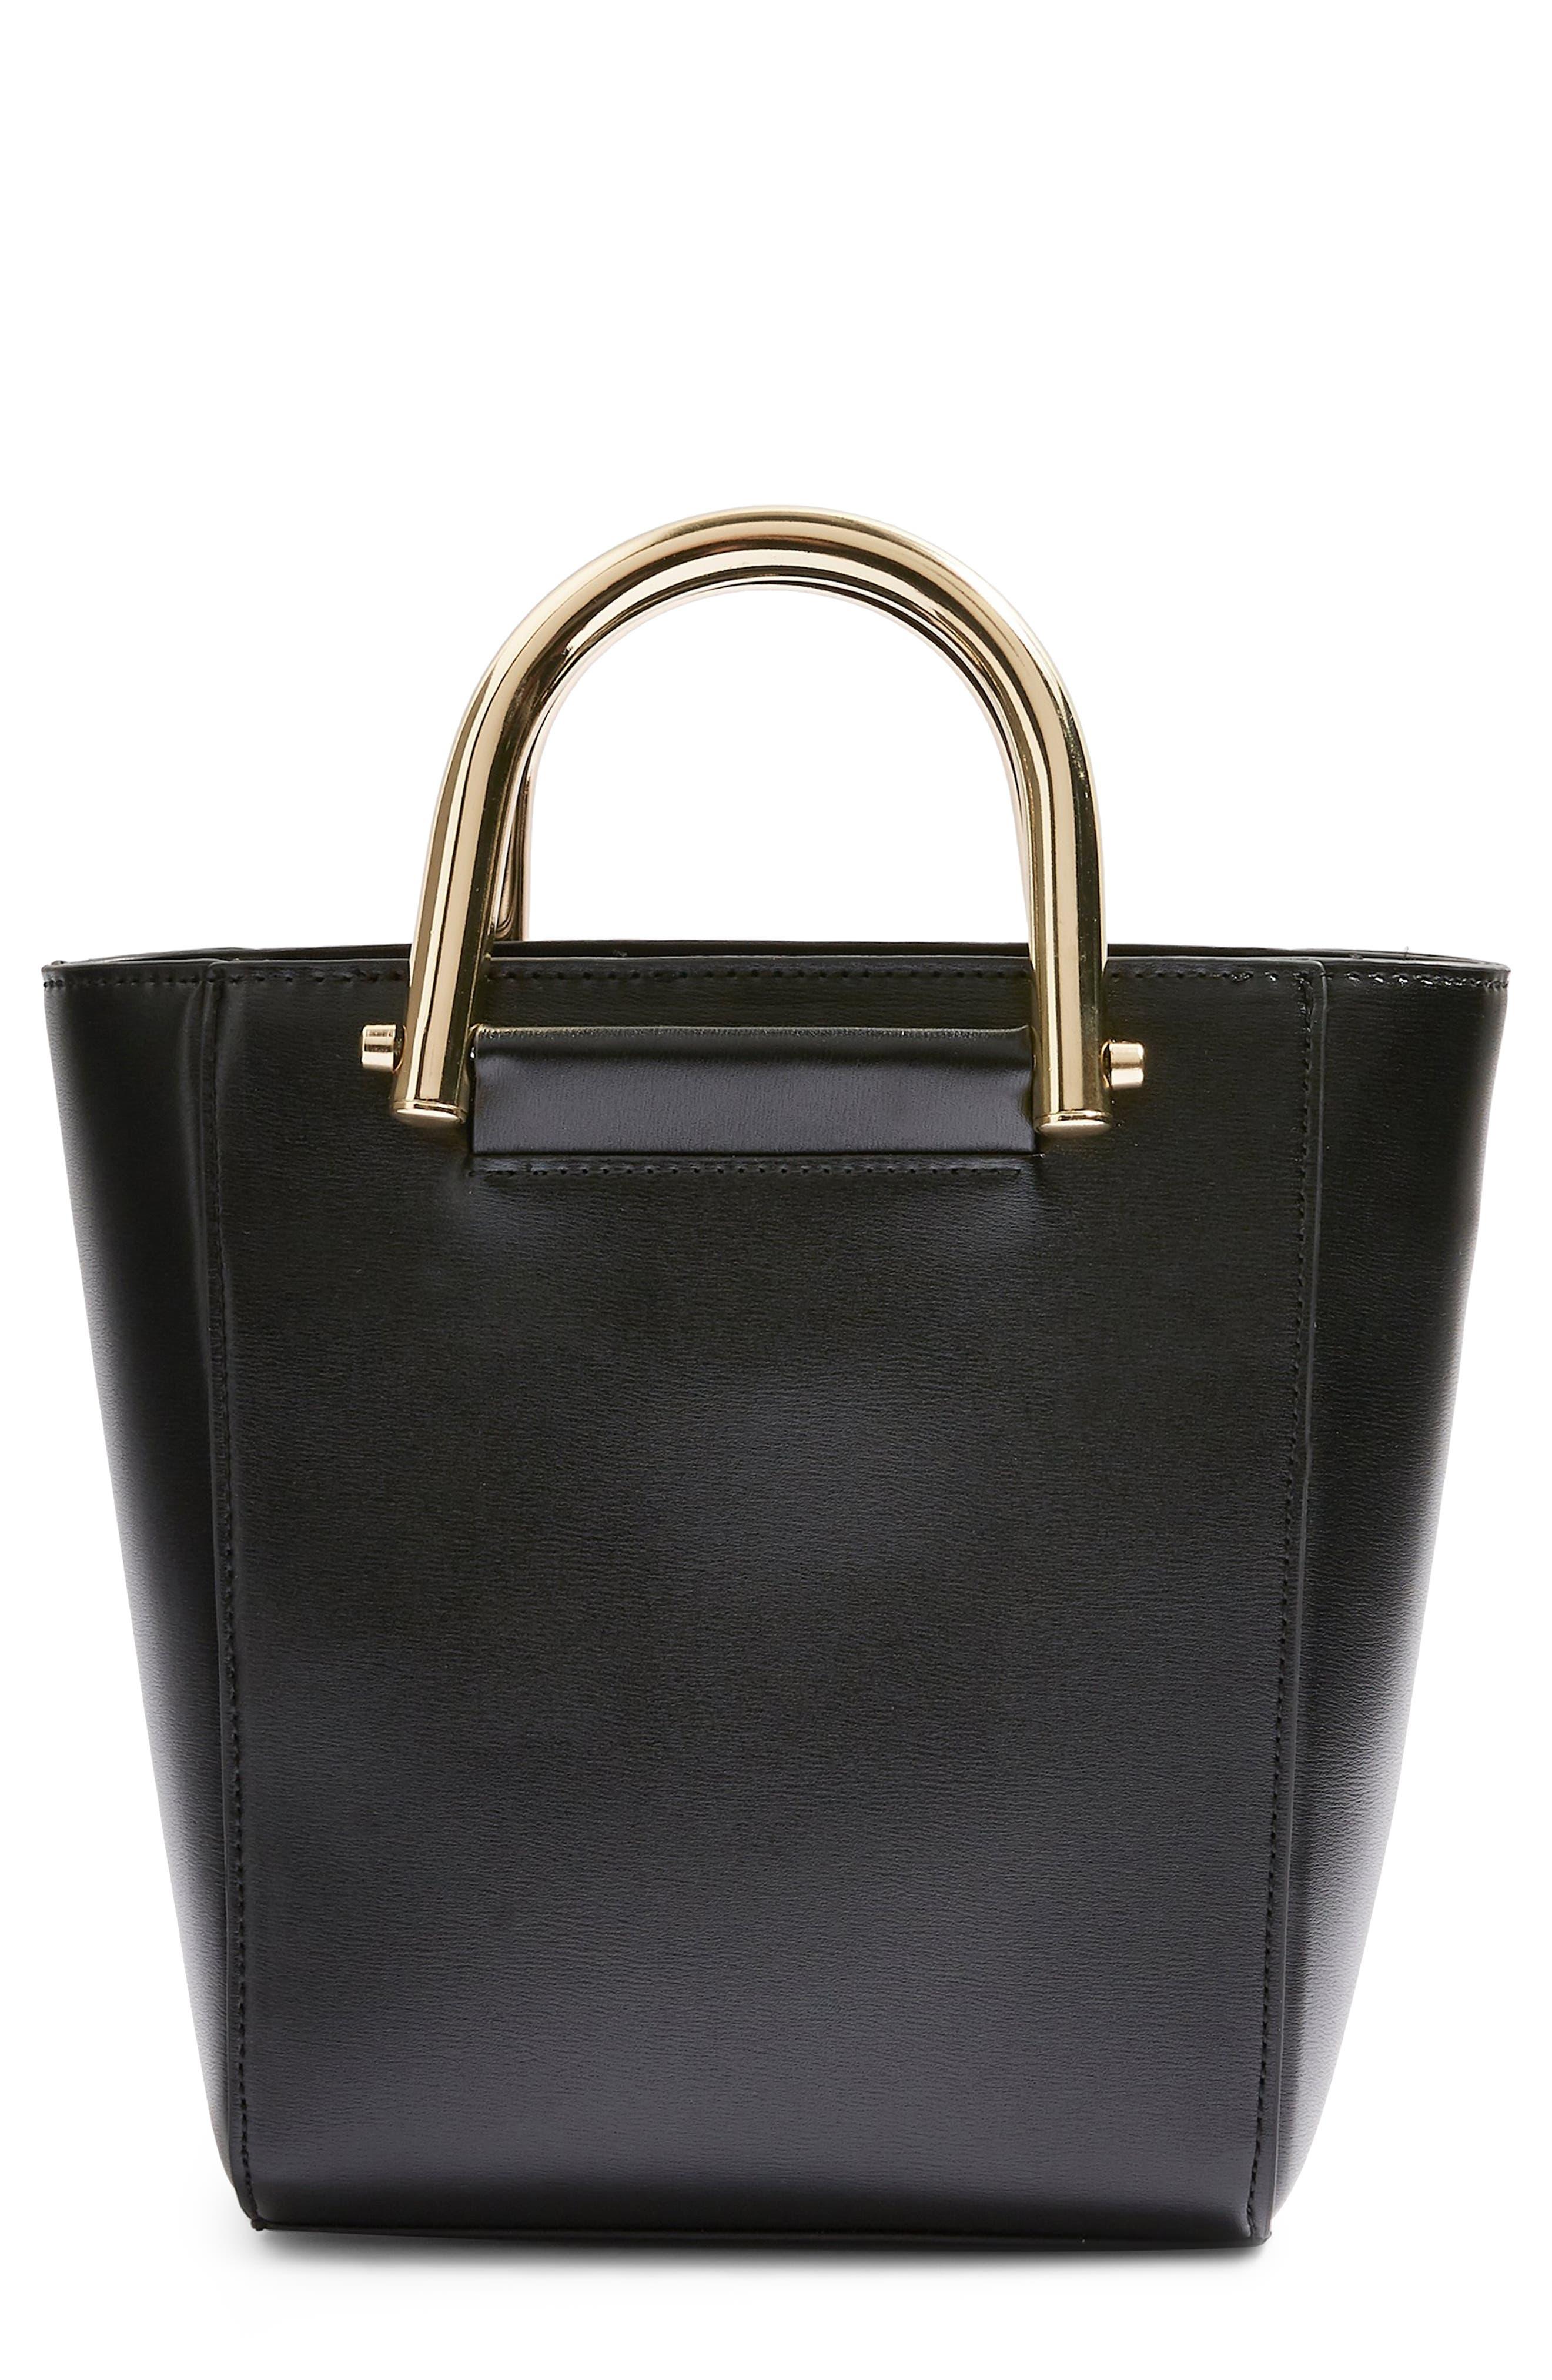 TOPSHOP Lacey Metal Top Handle Shoulder Bag, Main, color, 001